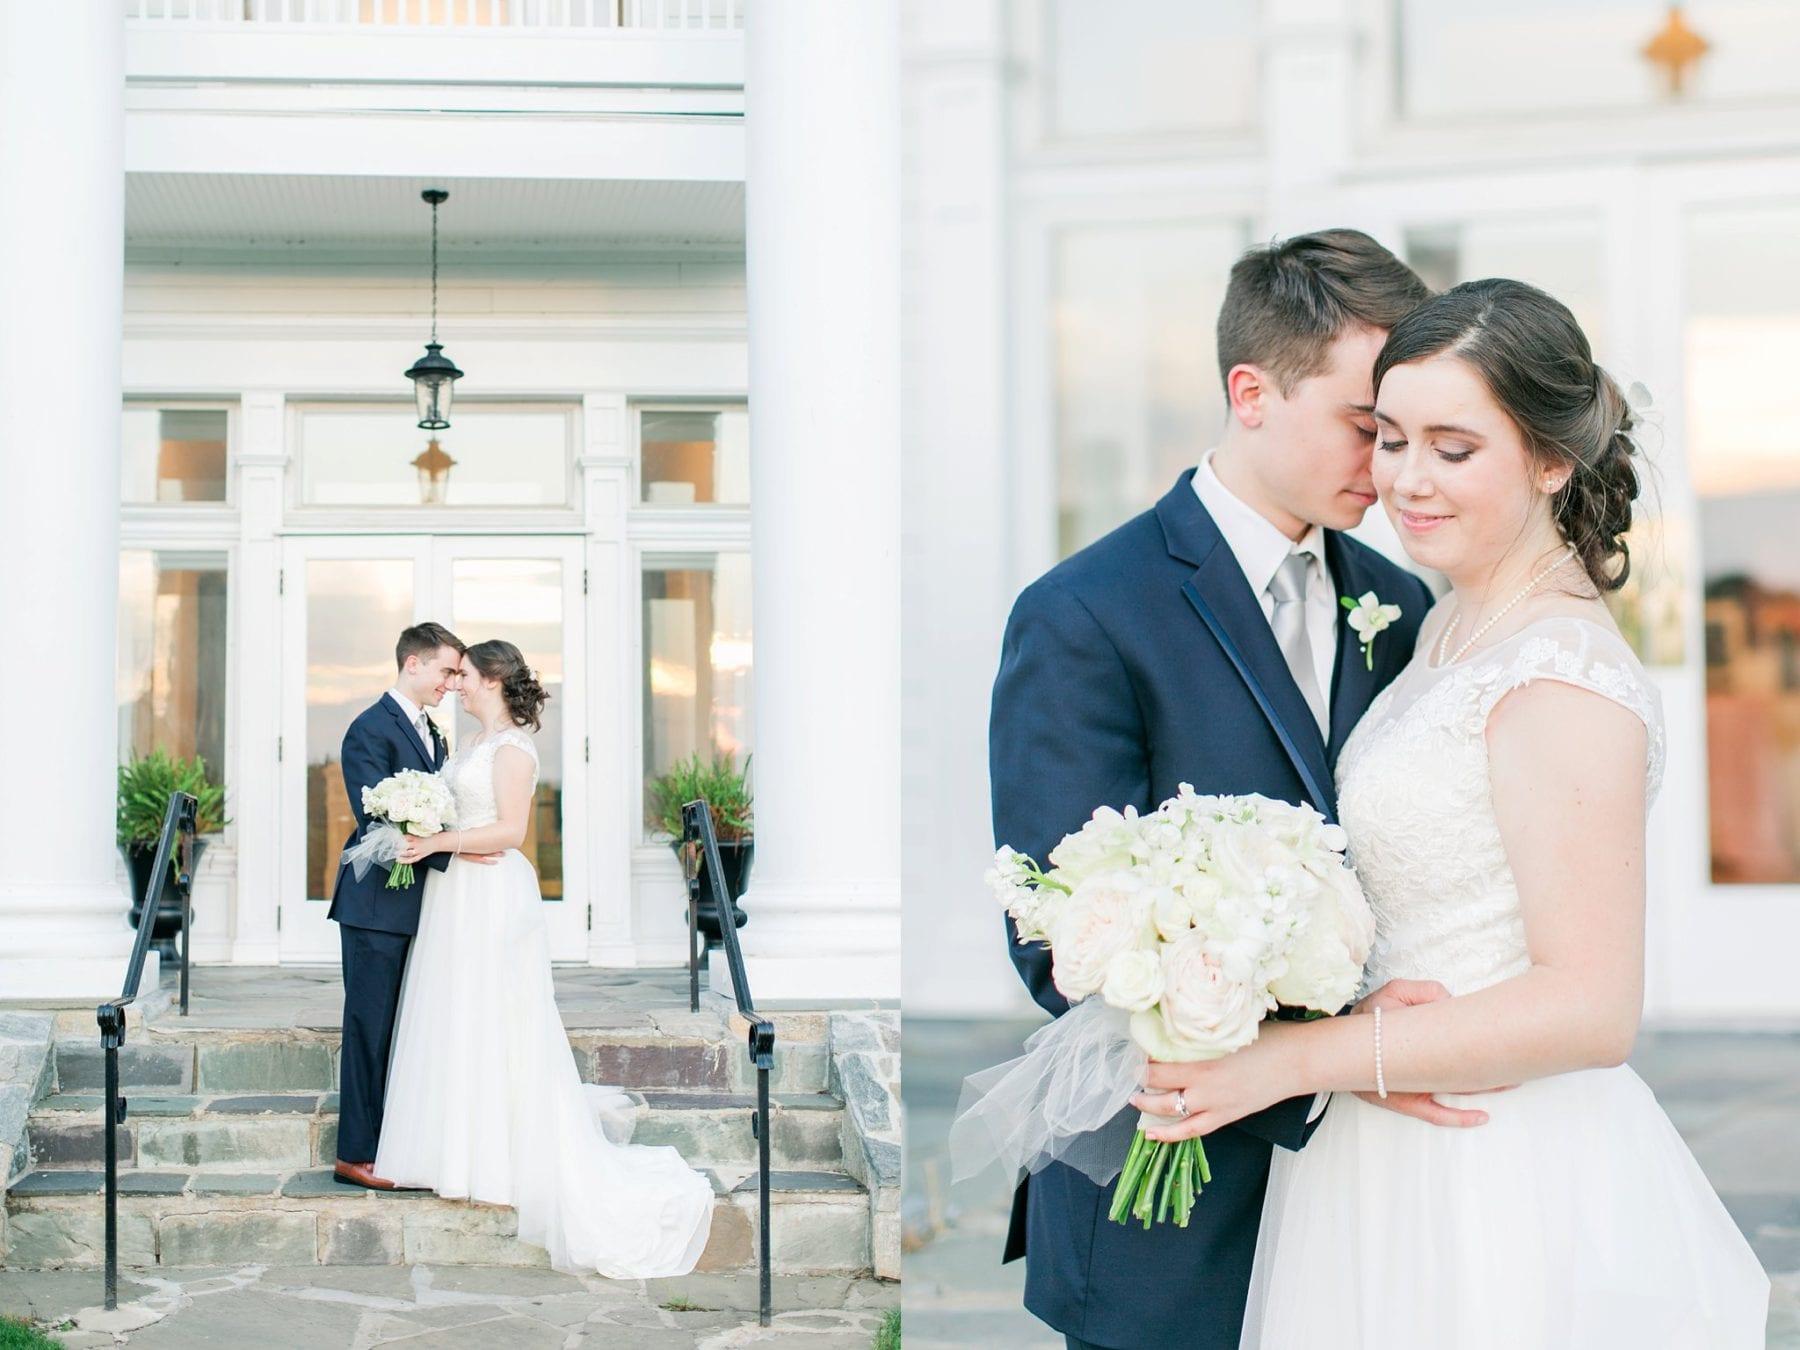 Bristow Manor Wedding Photos Virginia Wedding Photographer Lauren & Andrew Megan Kelsey Photography-596.jpg